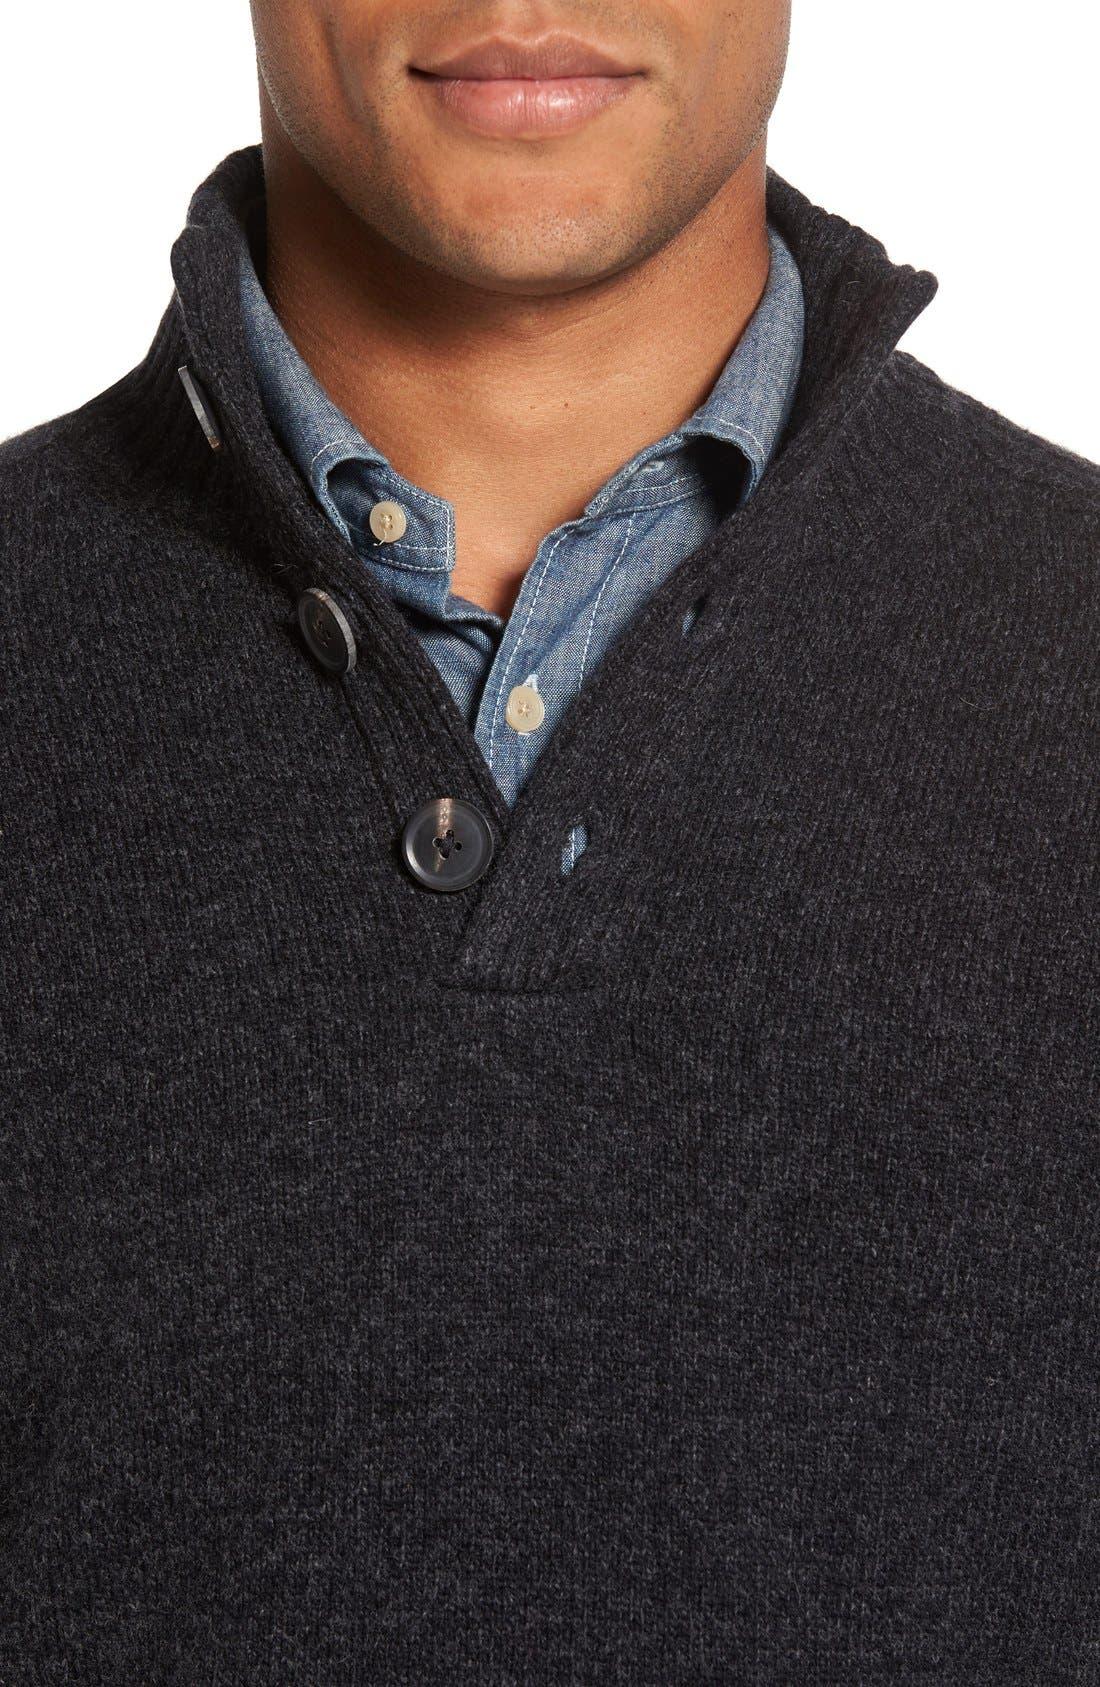 Birkenhead Mock Neck Sweater,                             Alternate thumbnail 4, color,                             021